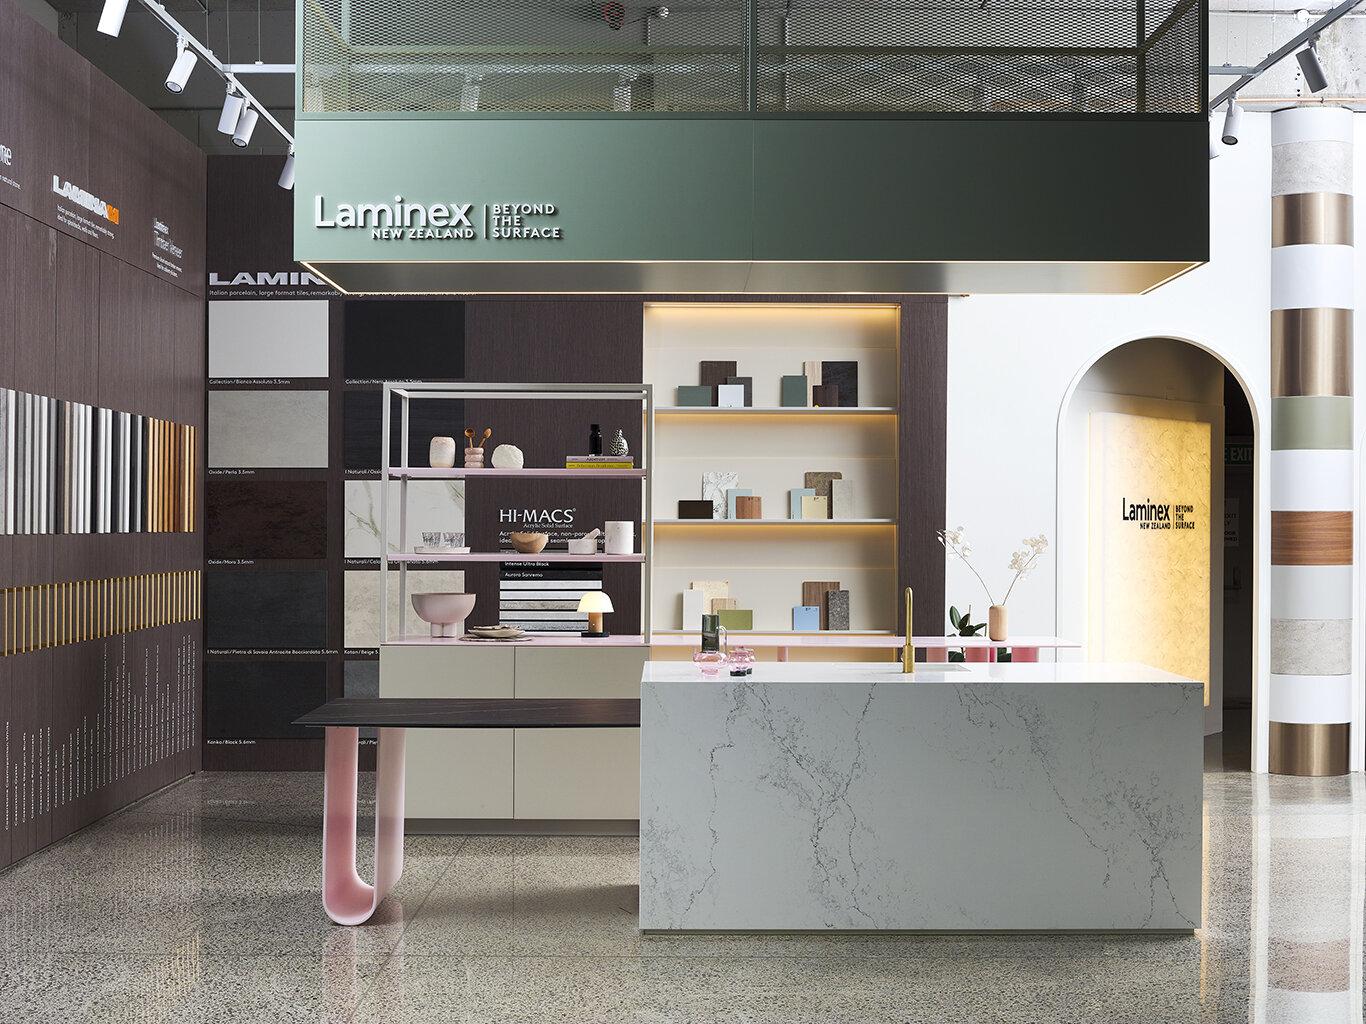 Laminex Showroom I Parnell — Material Creative